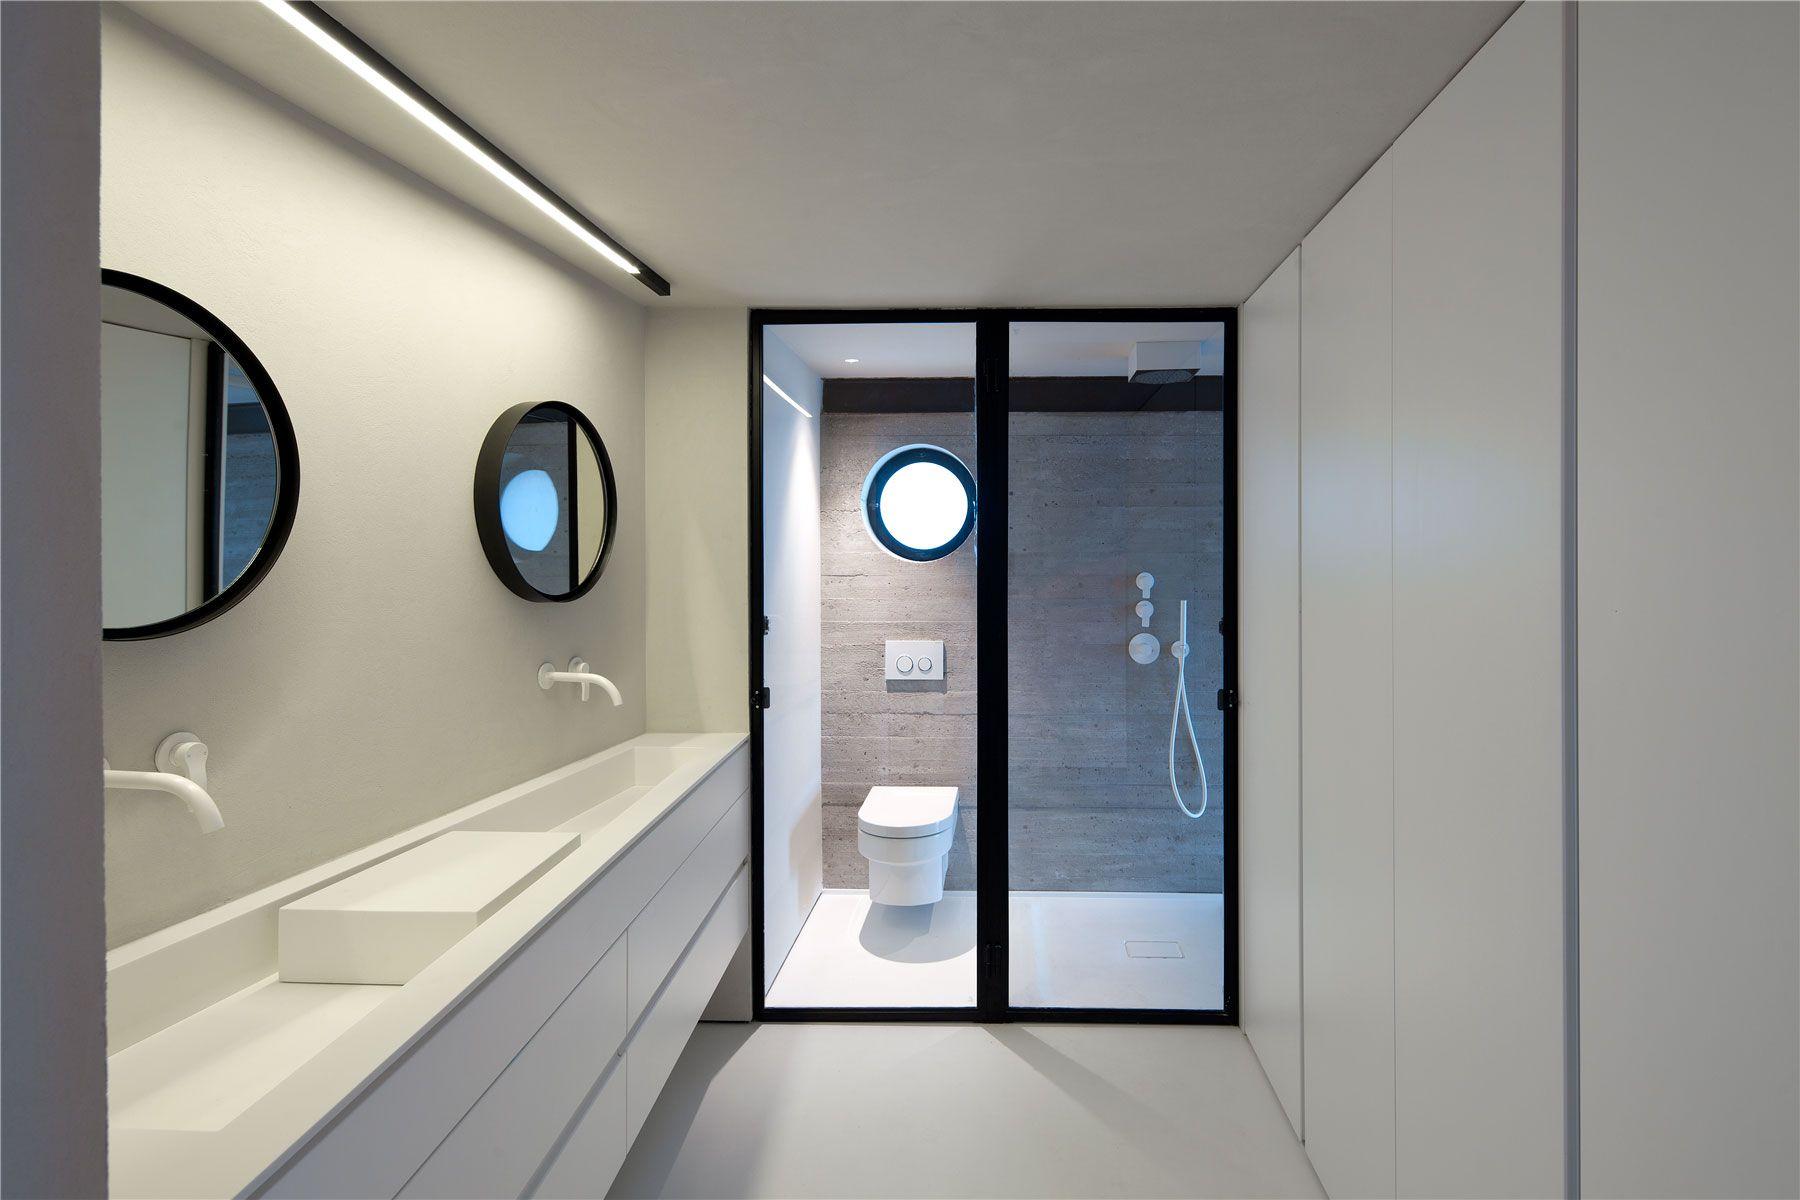 Badezimmer ideen blau factory jaffa house  pitsou kedem  baño  pinterest  badezimmer